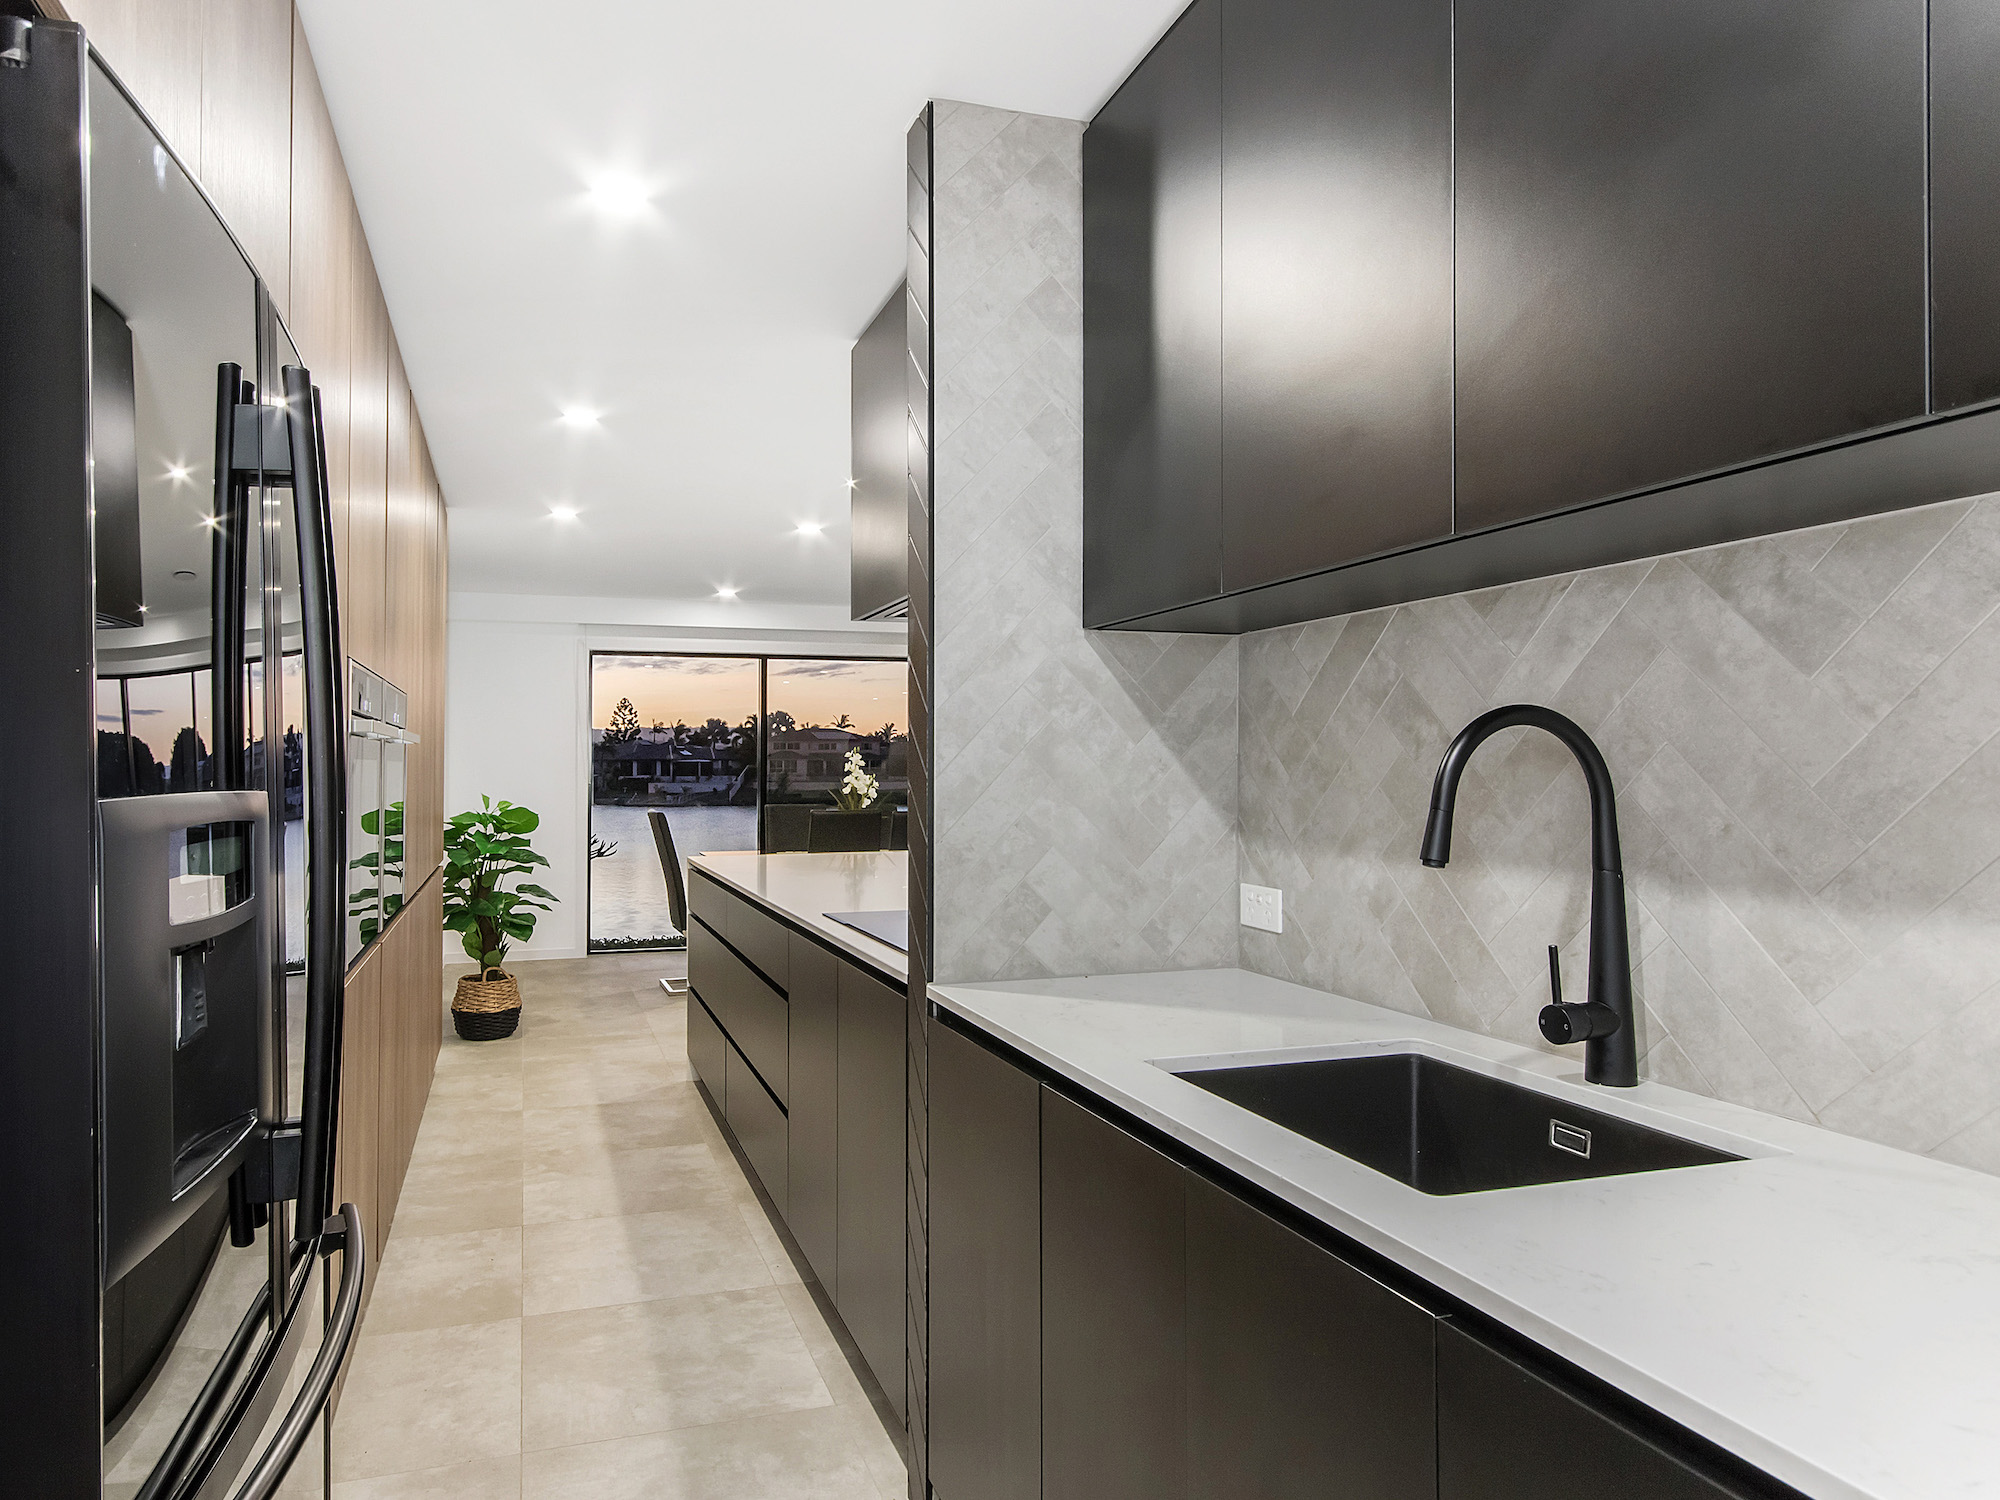 Modern concrete herringbone tiled splash back  with black kitchen sink and tap